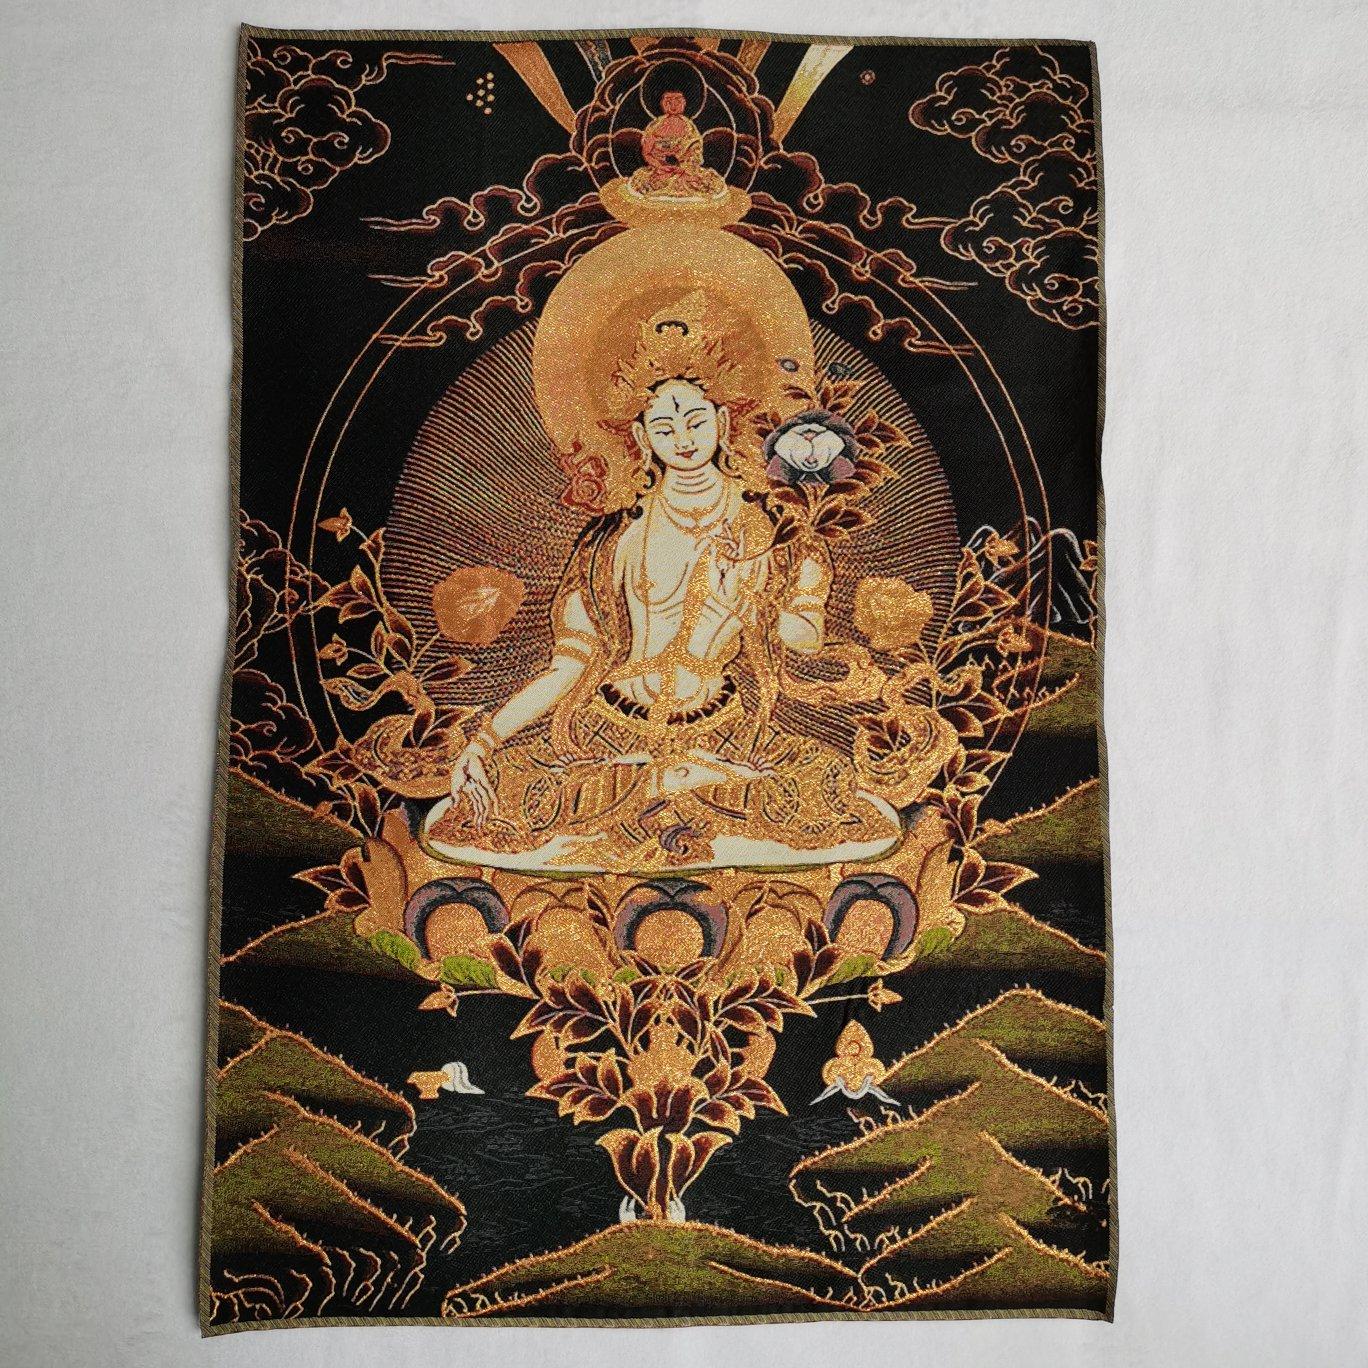 ibet antique buddha meditation thangka silk brocade tibetan buddha 36 Tibet Tibetan Embroidered  Cloth Silk Buddhism White Tara Tangka Thangka Mural Buddha Home Decor